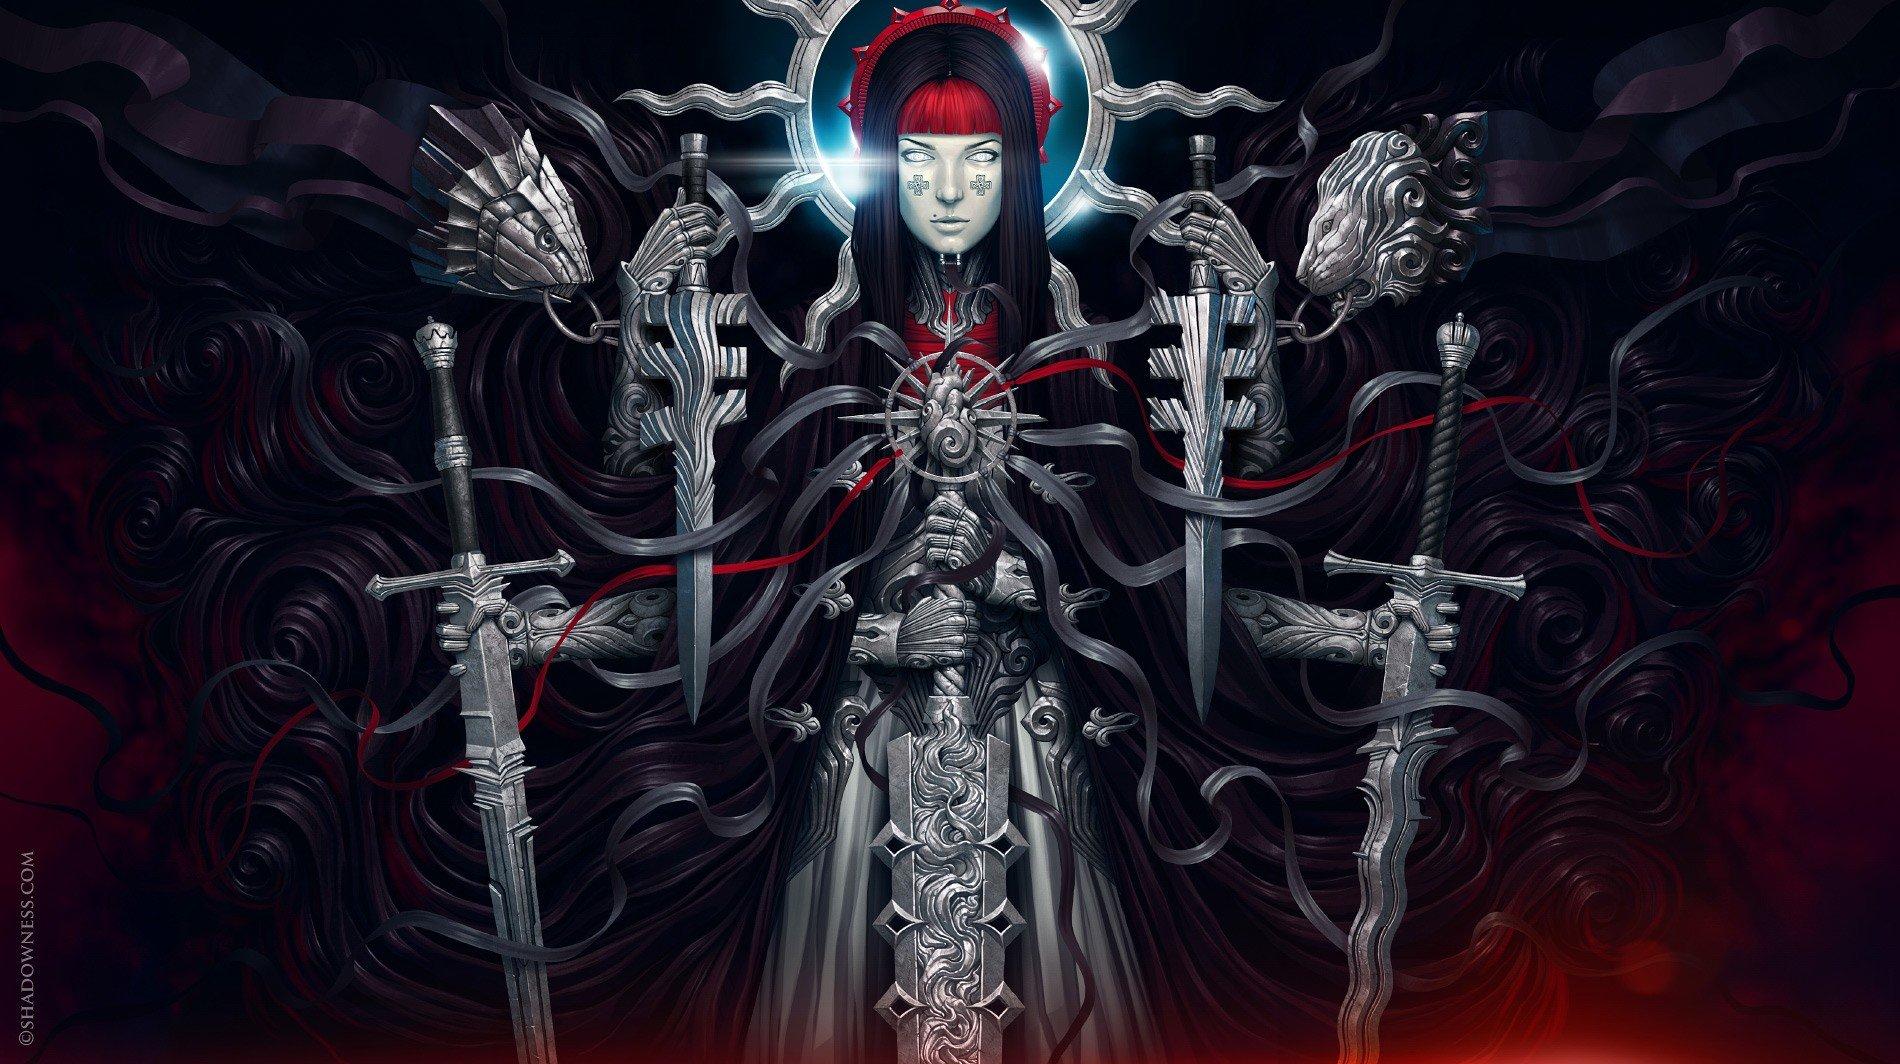 16 Souls - Изображение 6